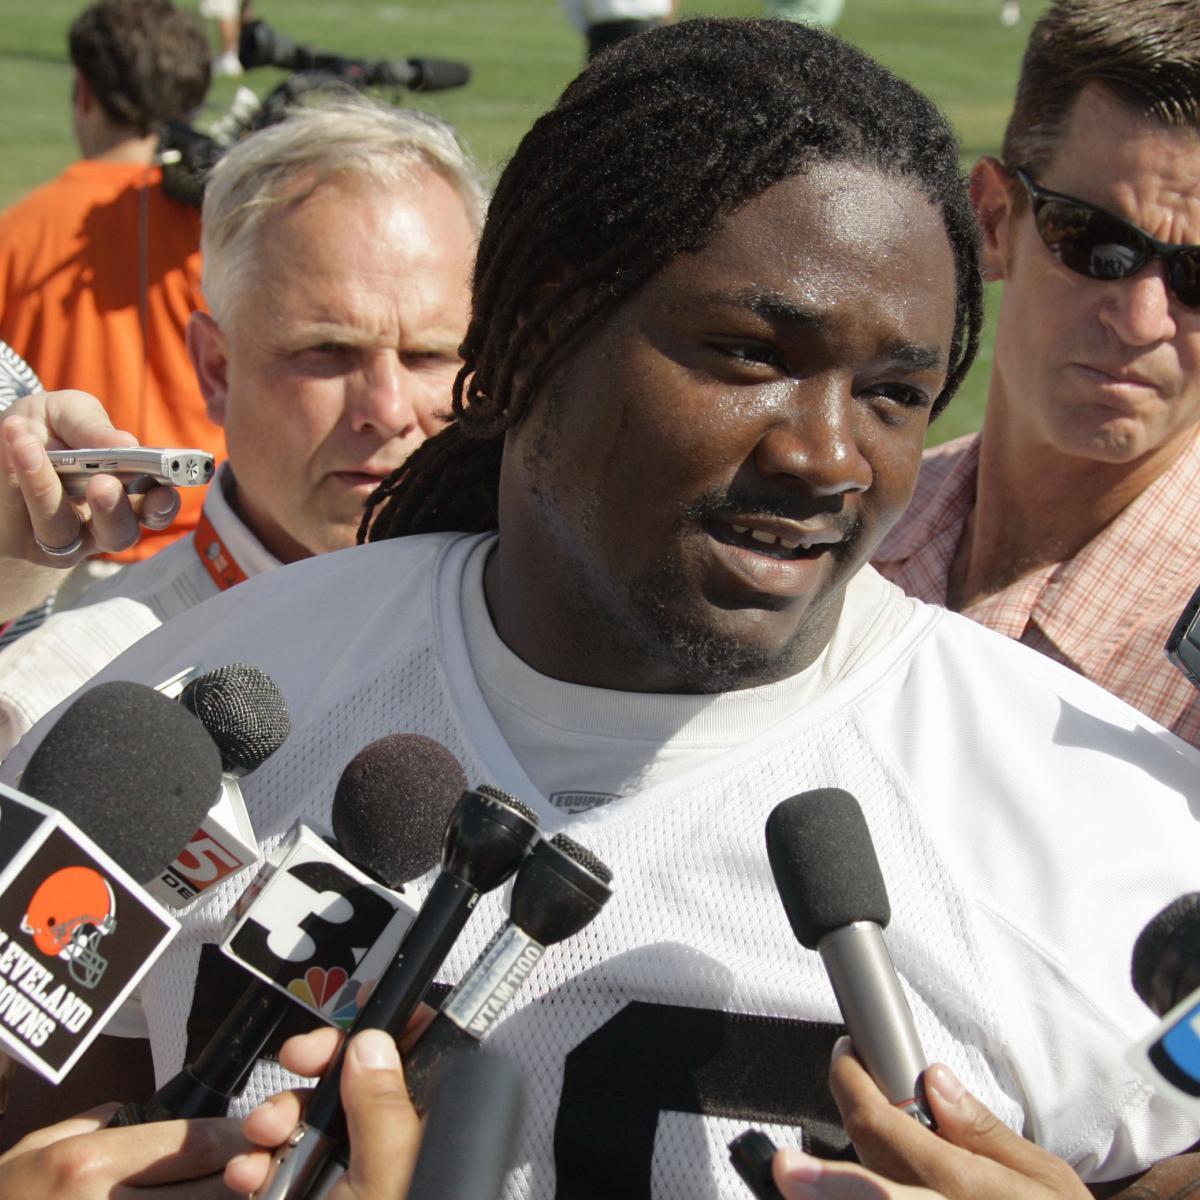 Alonzo Ephraim, Former Alabama Football Player, Arrested ...